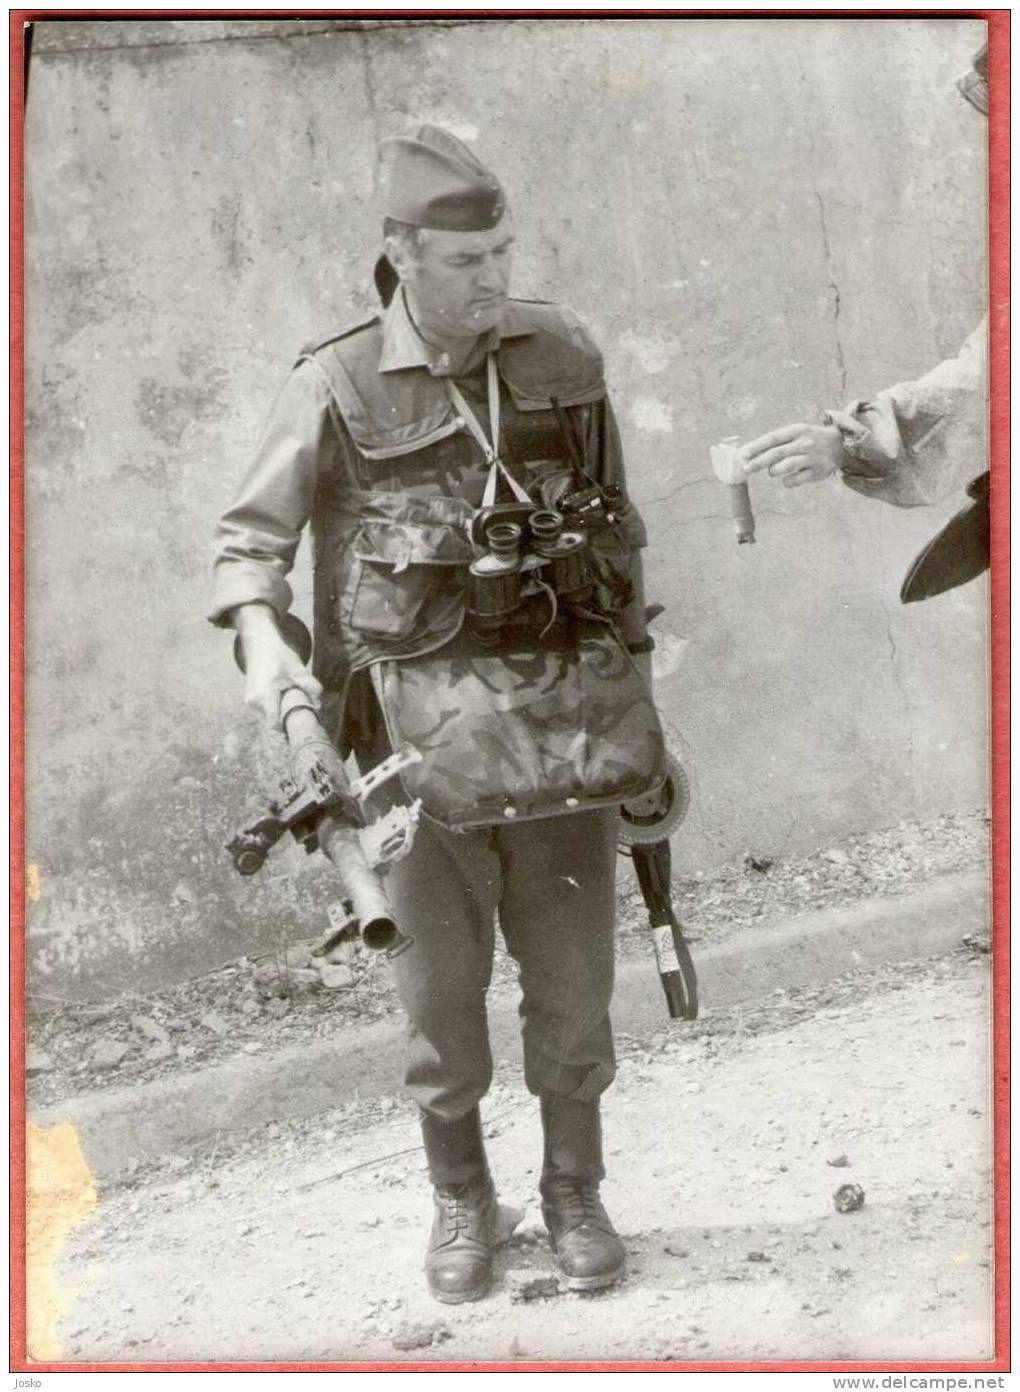 Ratko Mladic | Military diorama, Bosnian war, Military gear